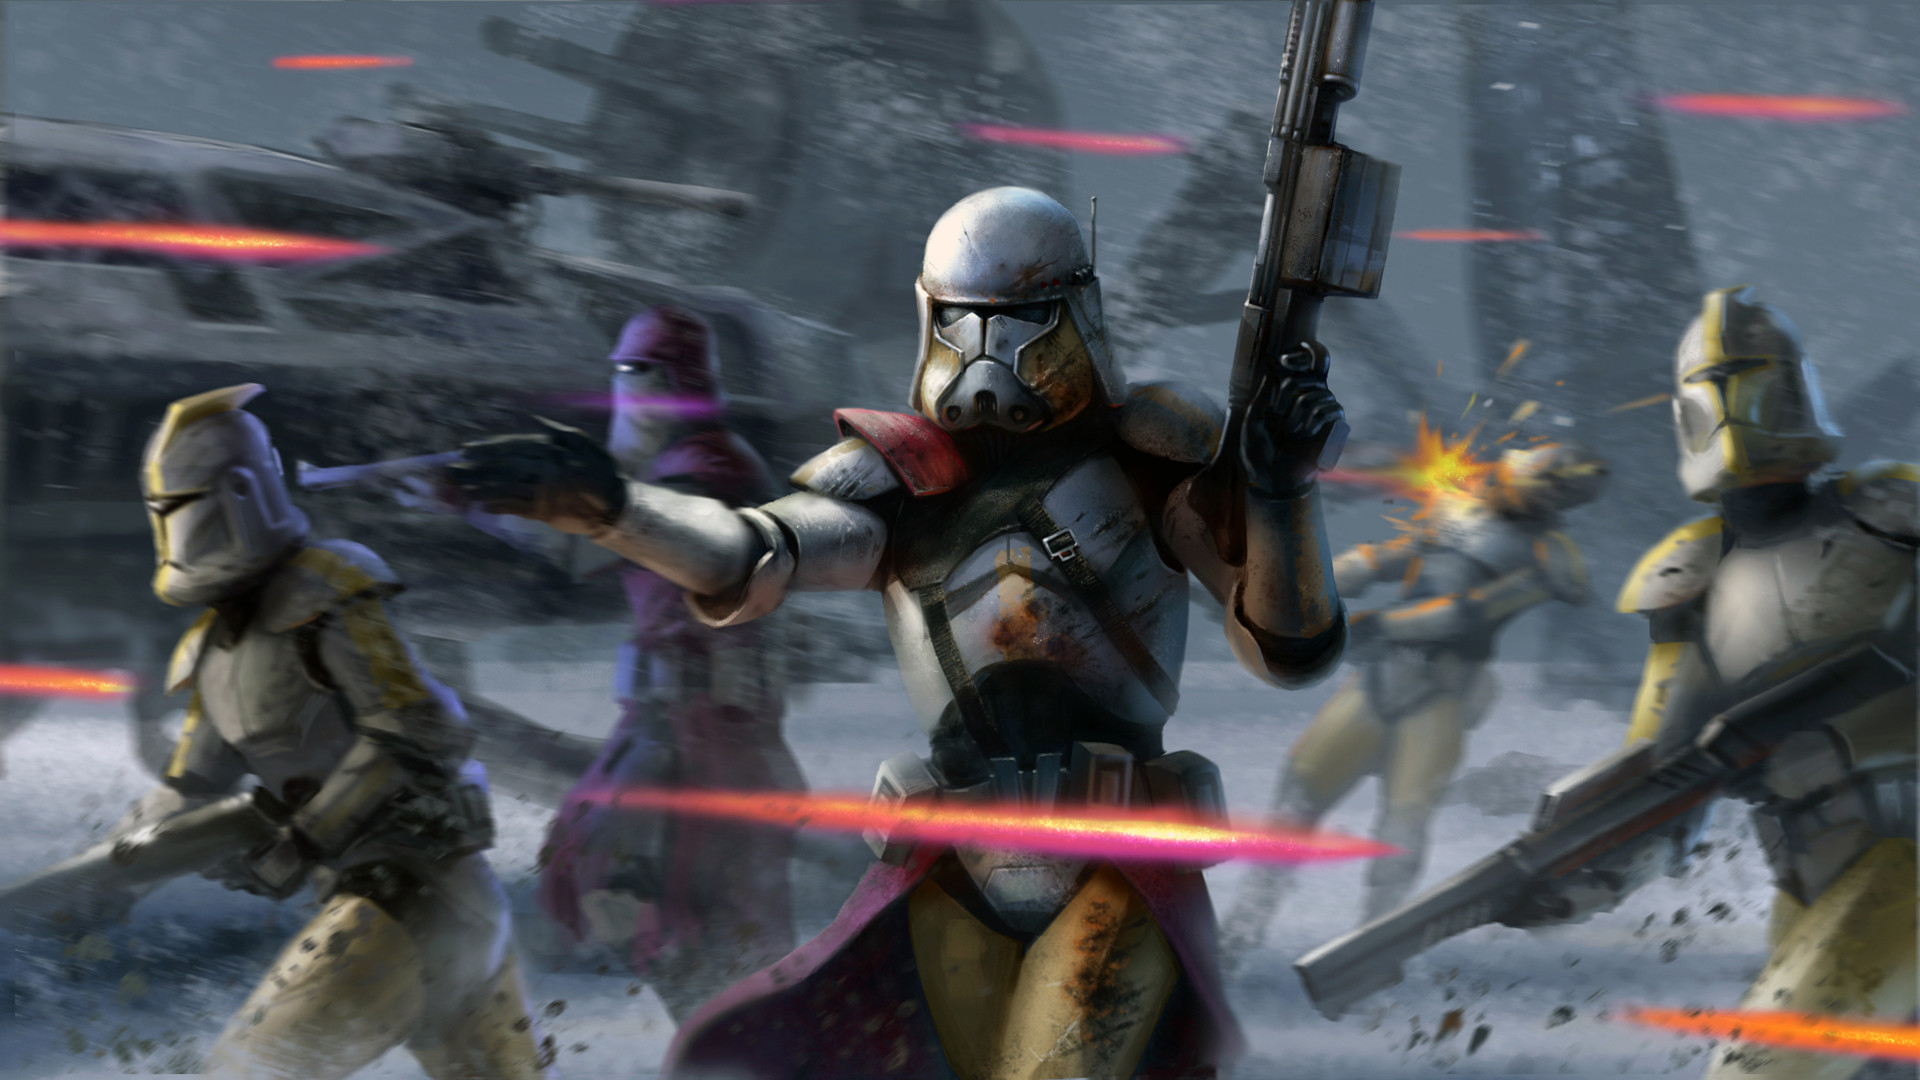 Star Wars The Clone Wars Ahsoka 6814 wallpaper   Desktop Wallpapers    Pinterest